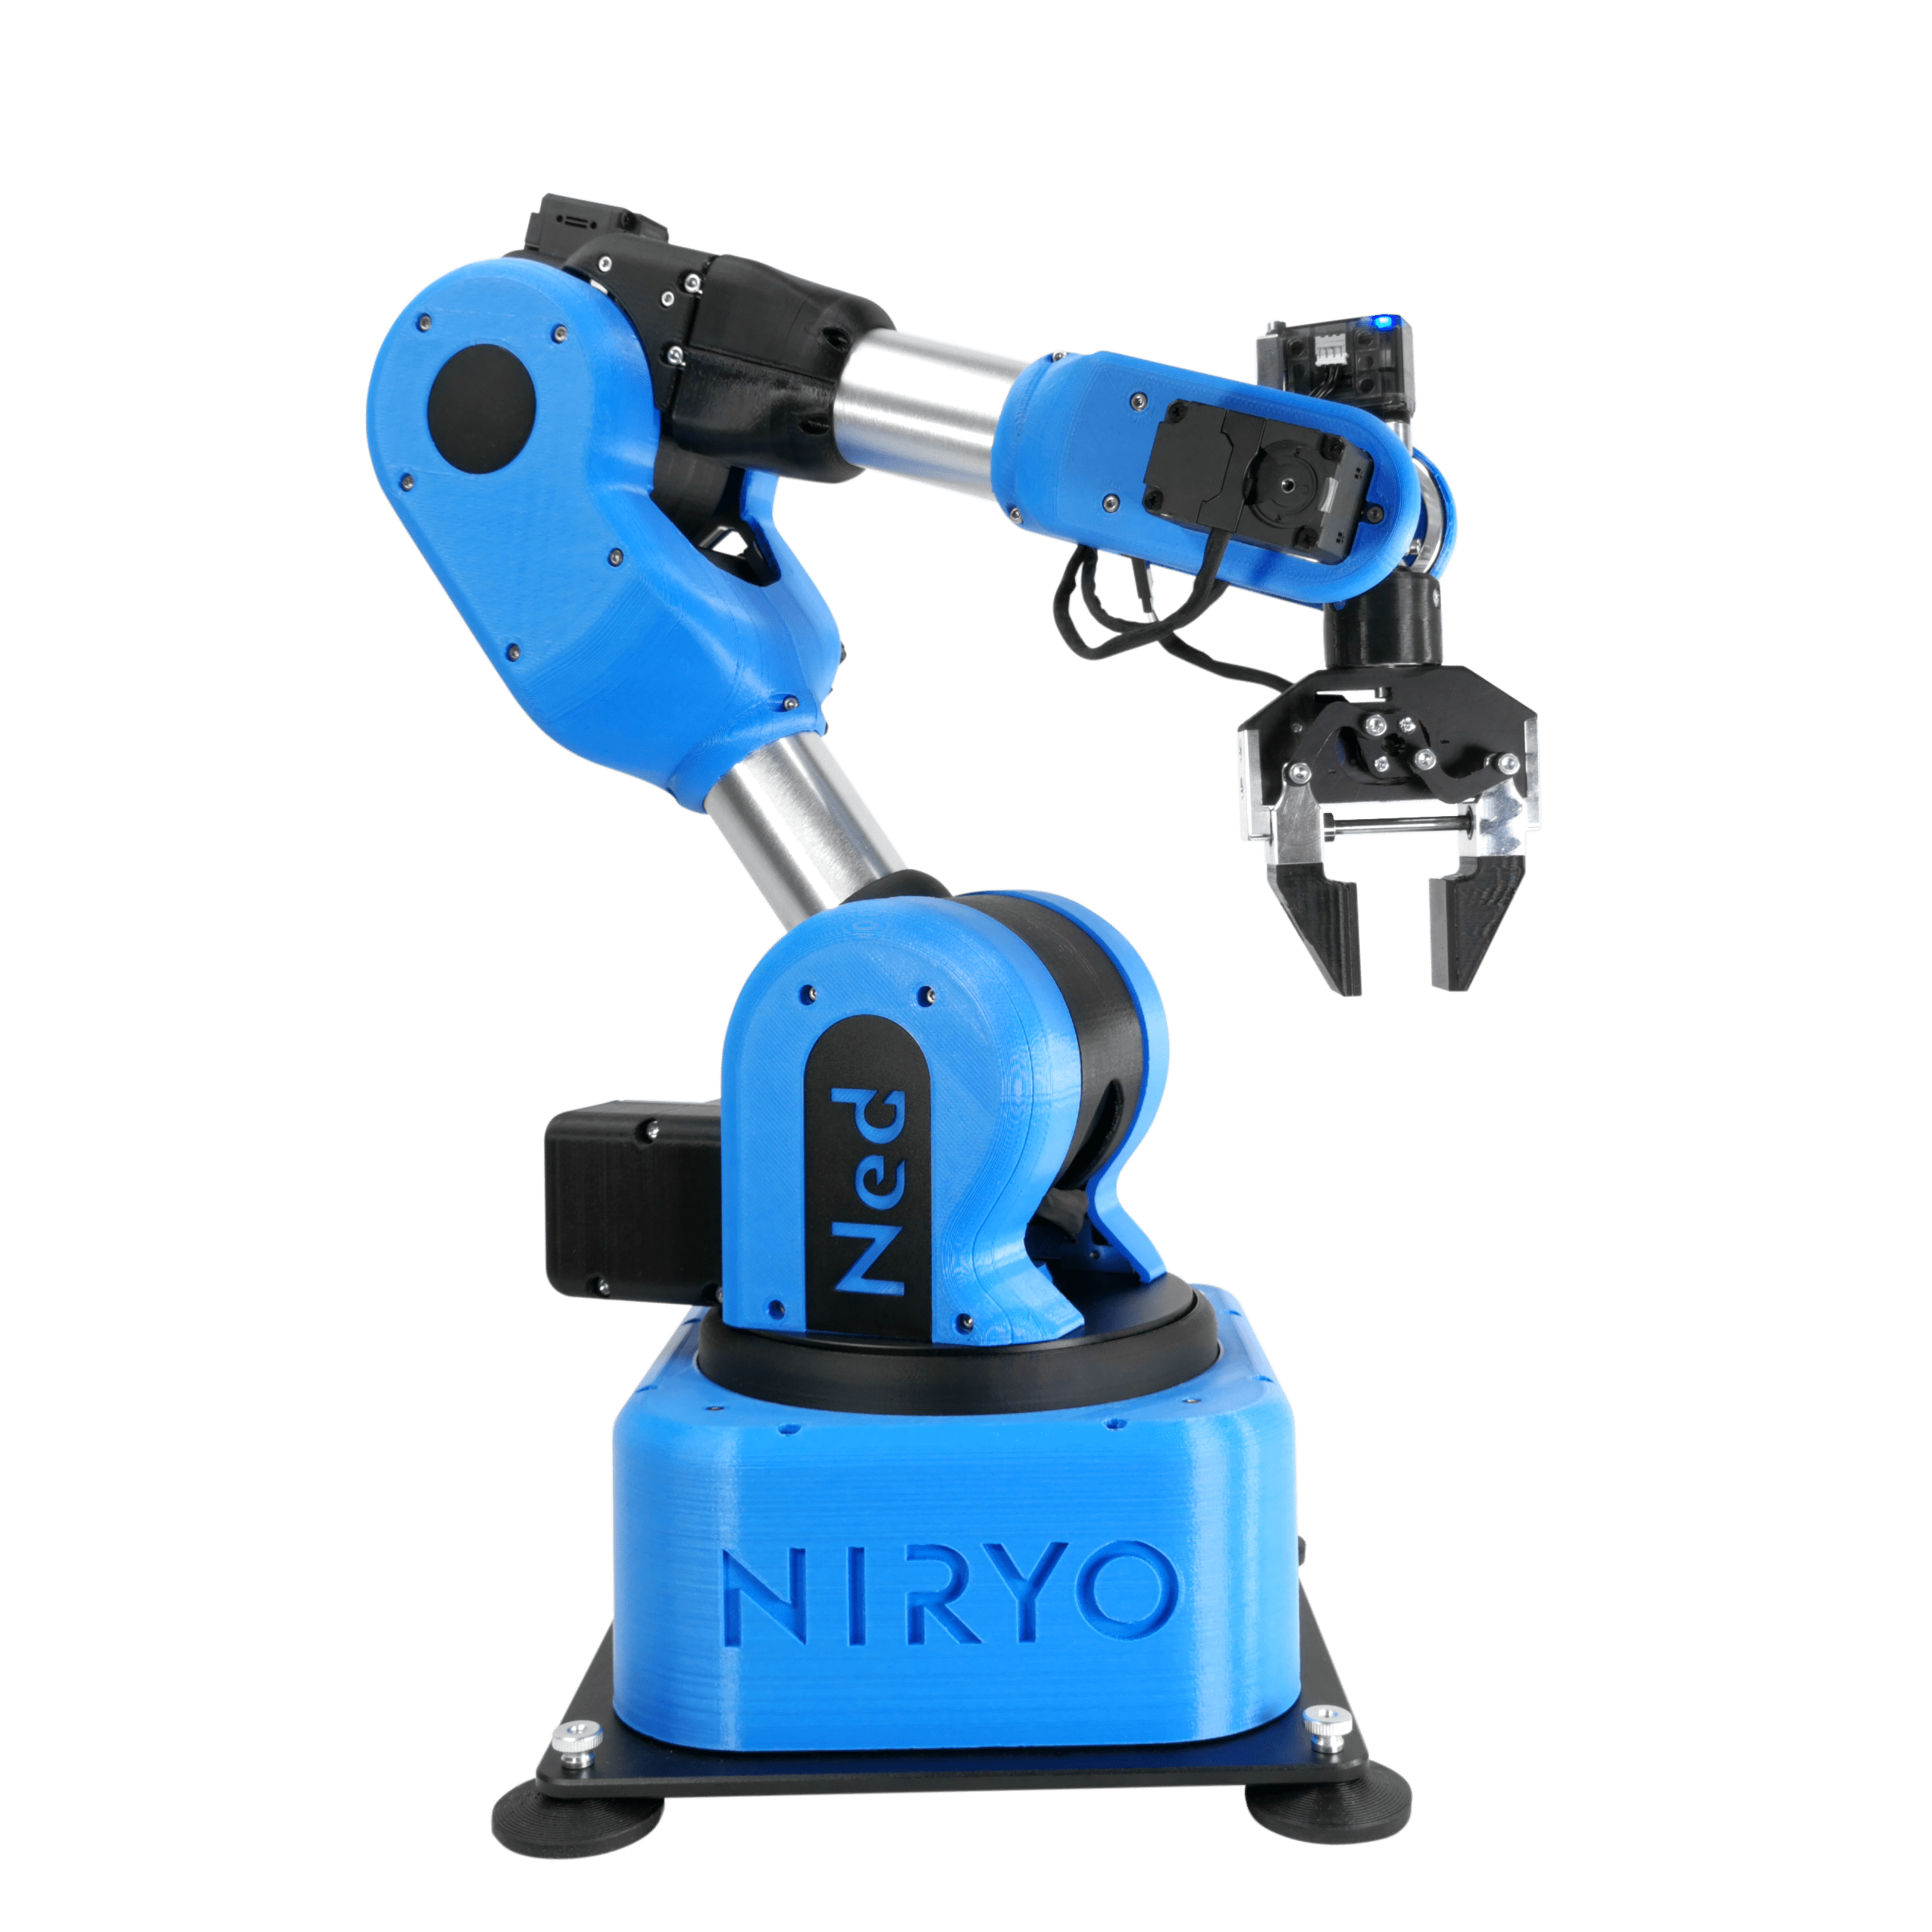 Niryo NED - 6-assige aluminium robotarm